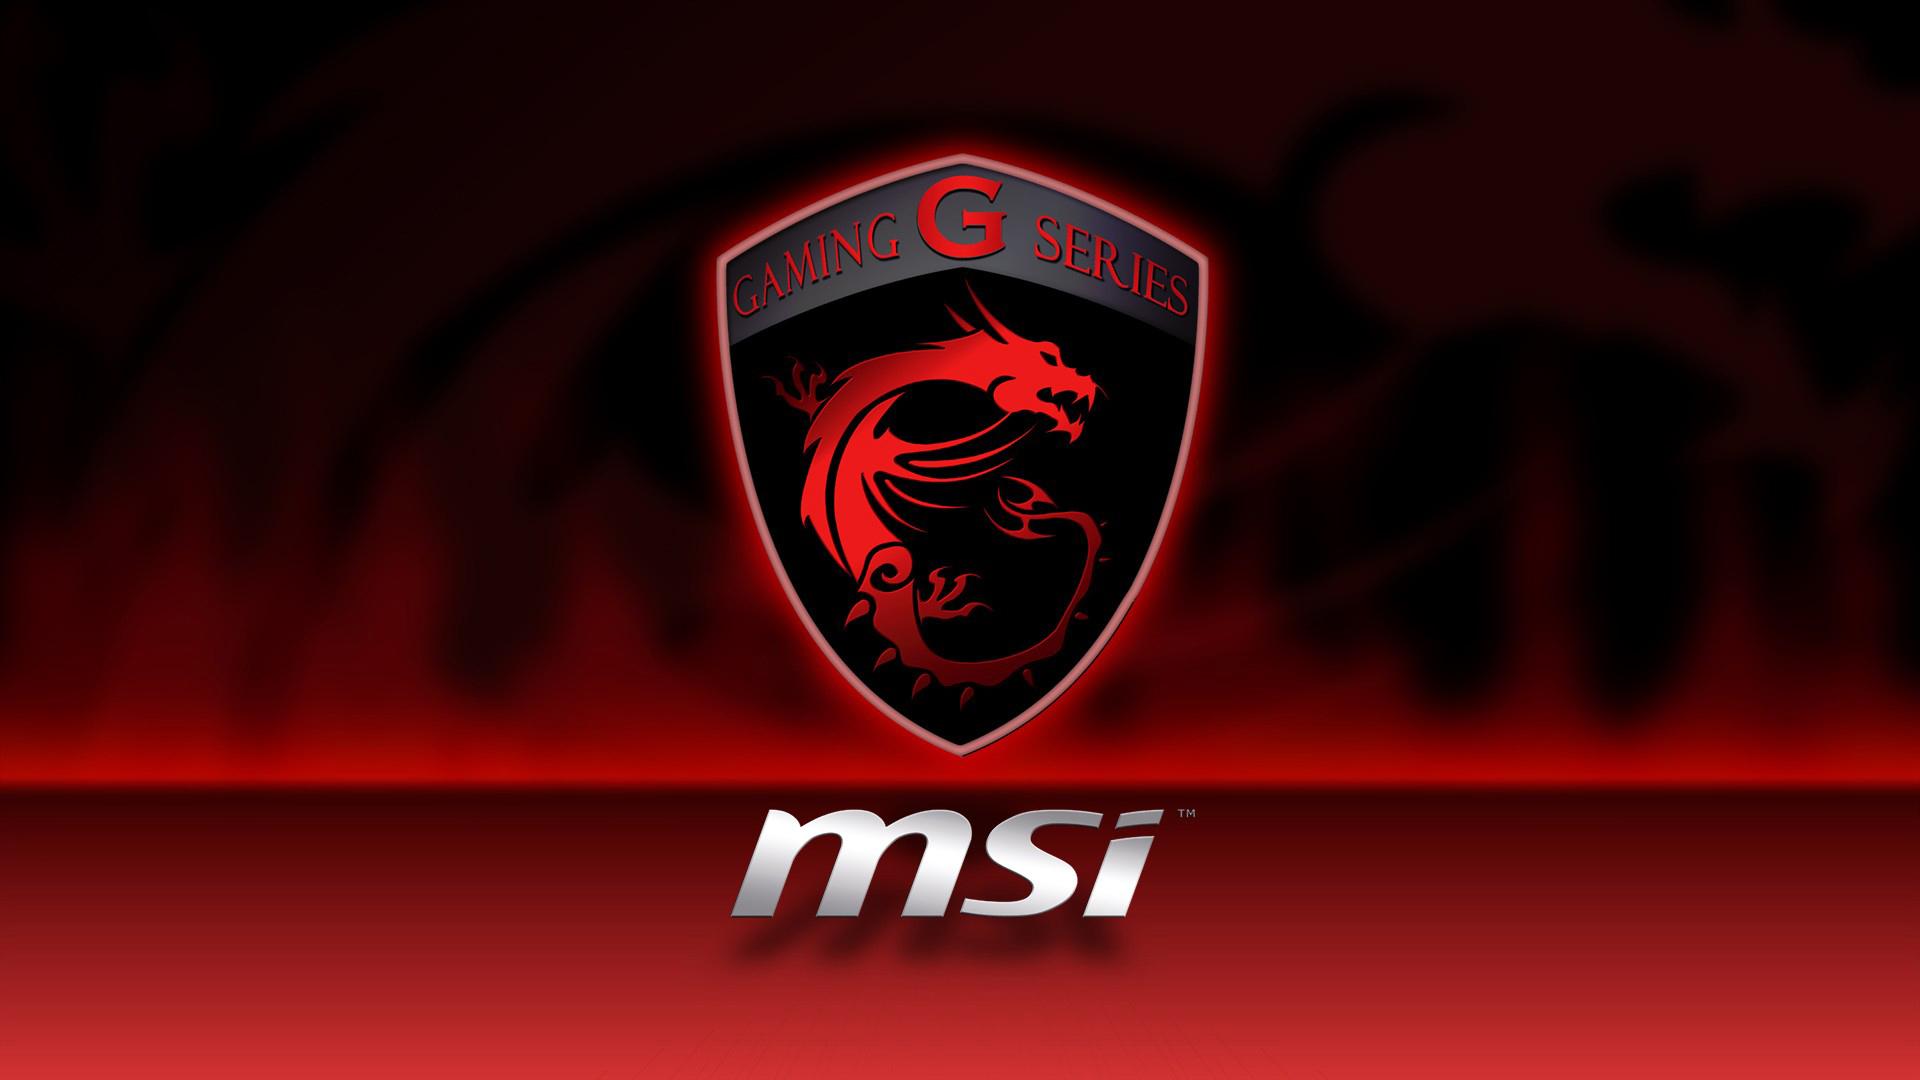 Msi g series wallpaper notebookreview - Msi Gaming G Series Dragon Logo Hd 1920x1080 1080p Wallpaper